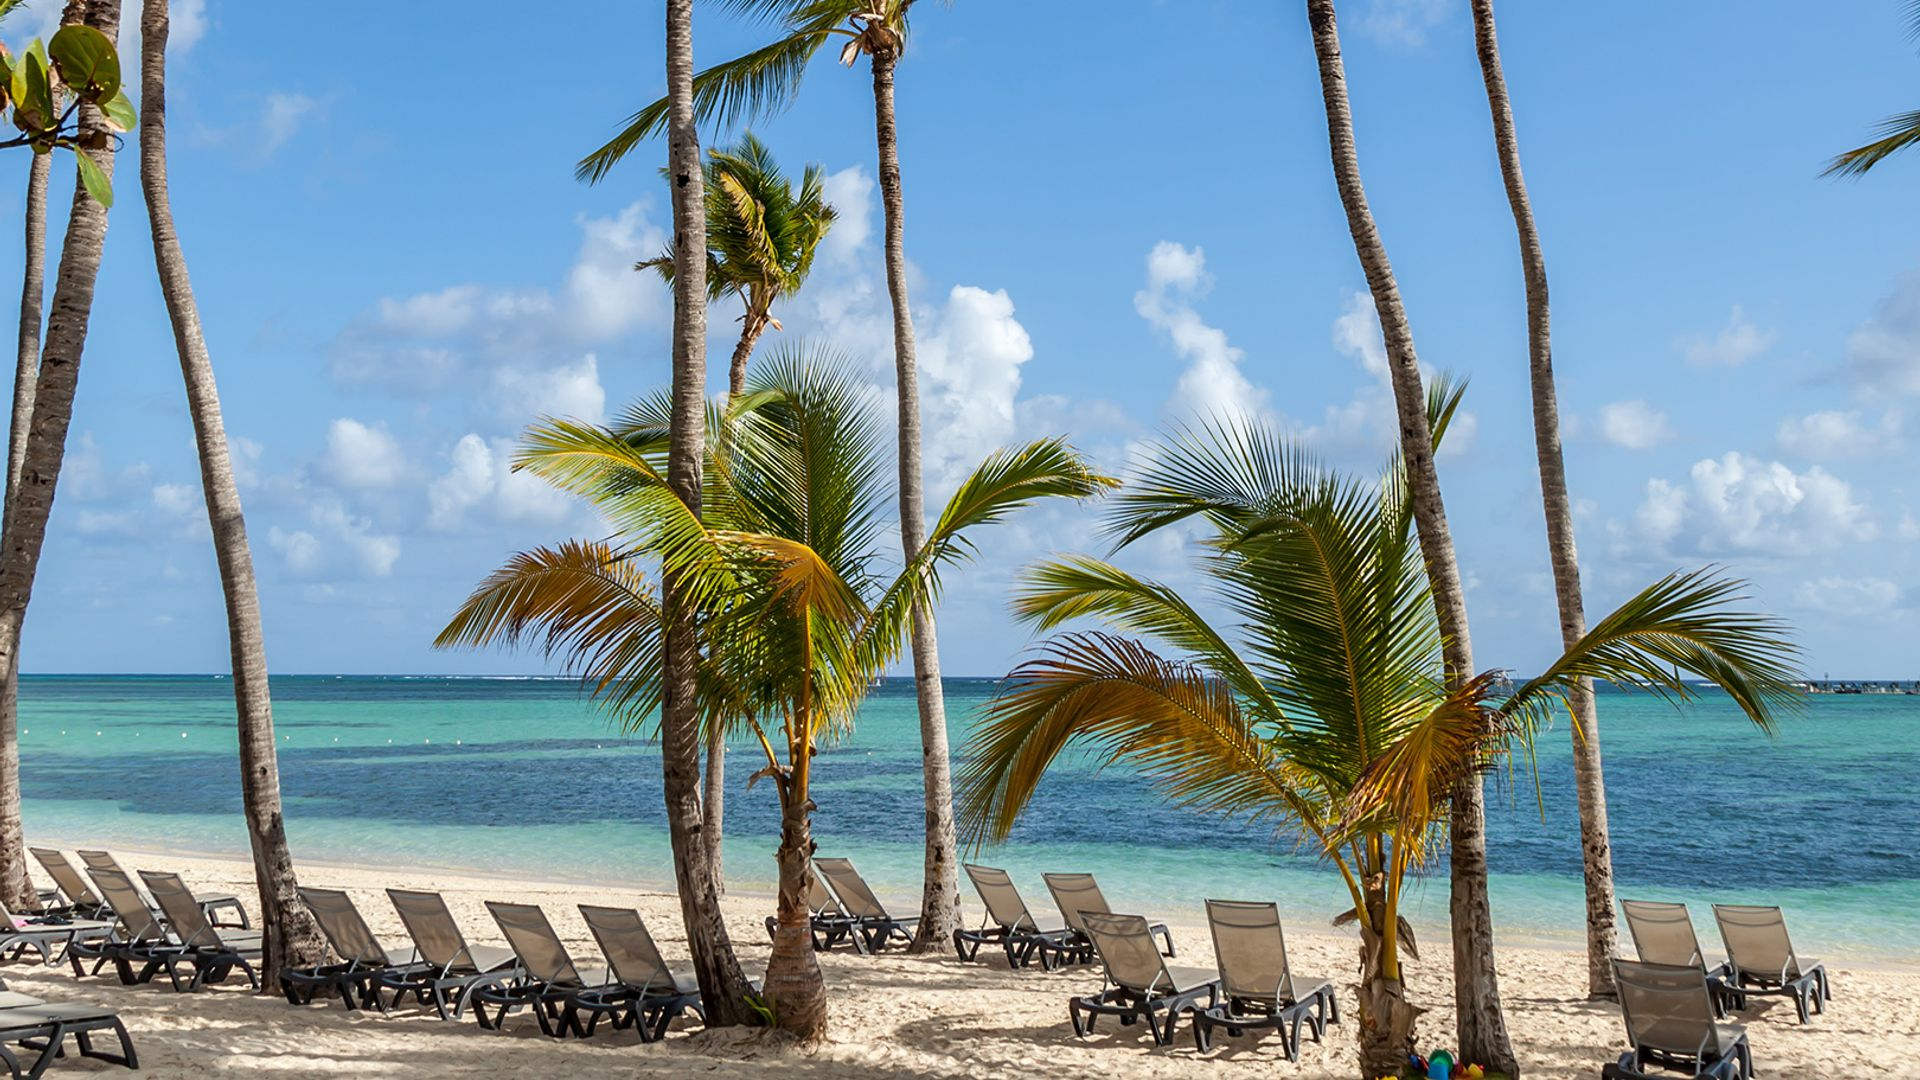 Revelion 2022 - Sejur plaja Punta Cana, Republica Dominicana, 14 zile